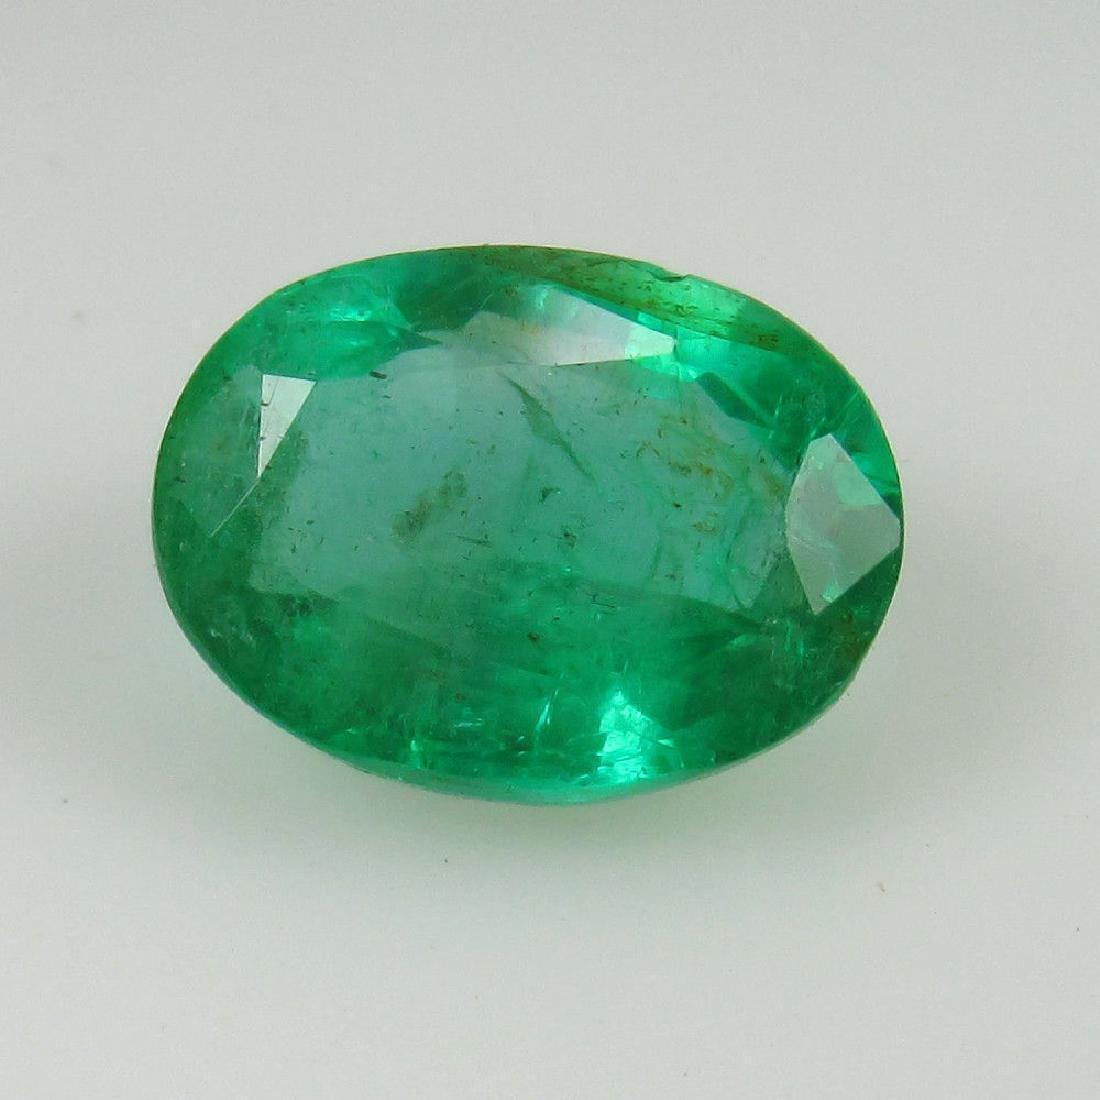 1.79 Ct Genuine Zambian Emerald Nice Oval Cut - 2